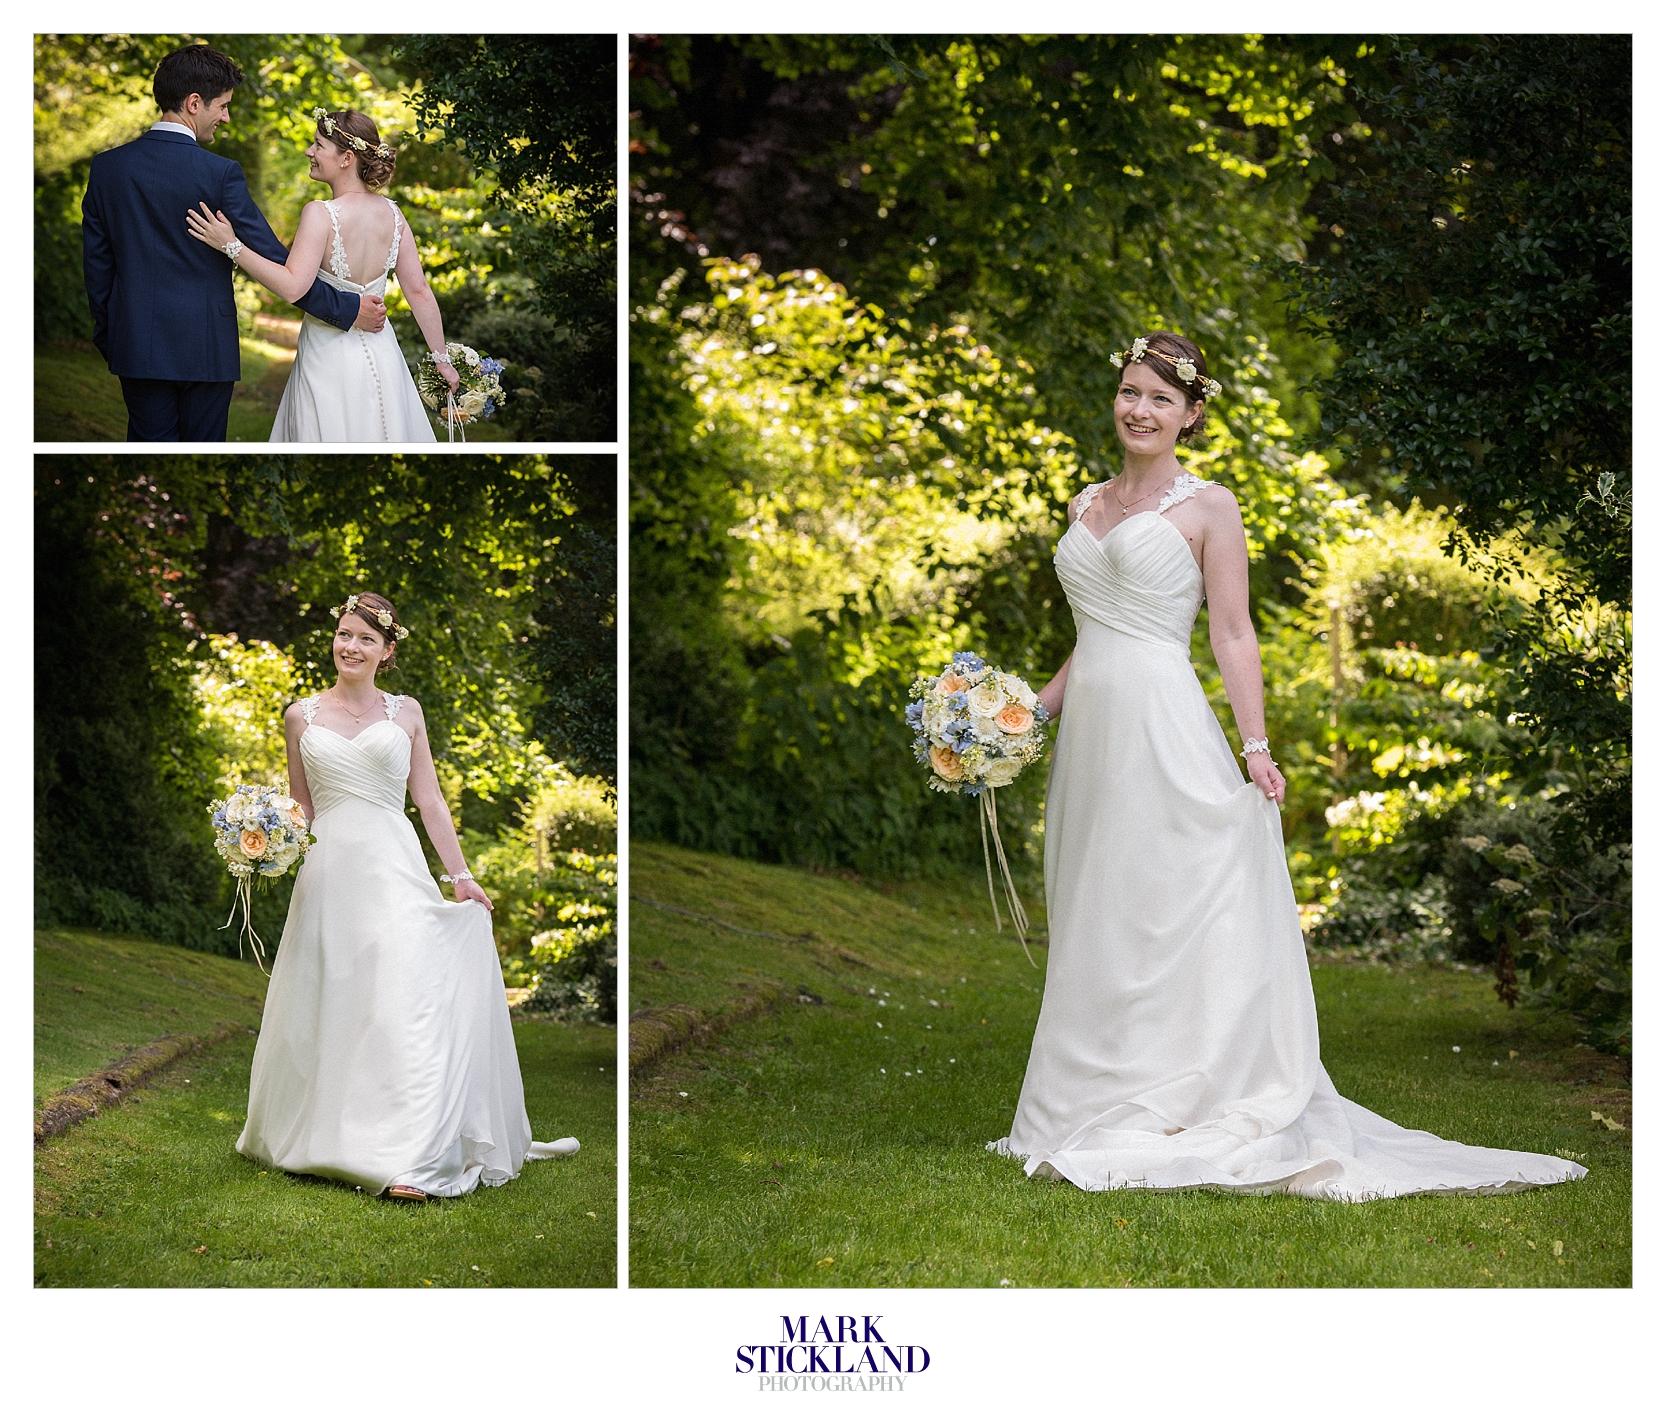 Springhead_wedding_fontmell magna_dorset_0016